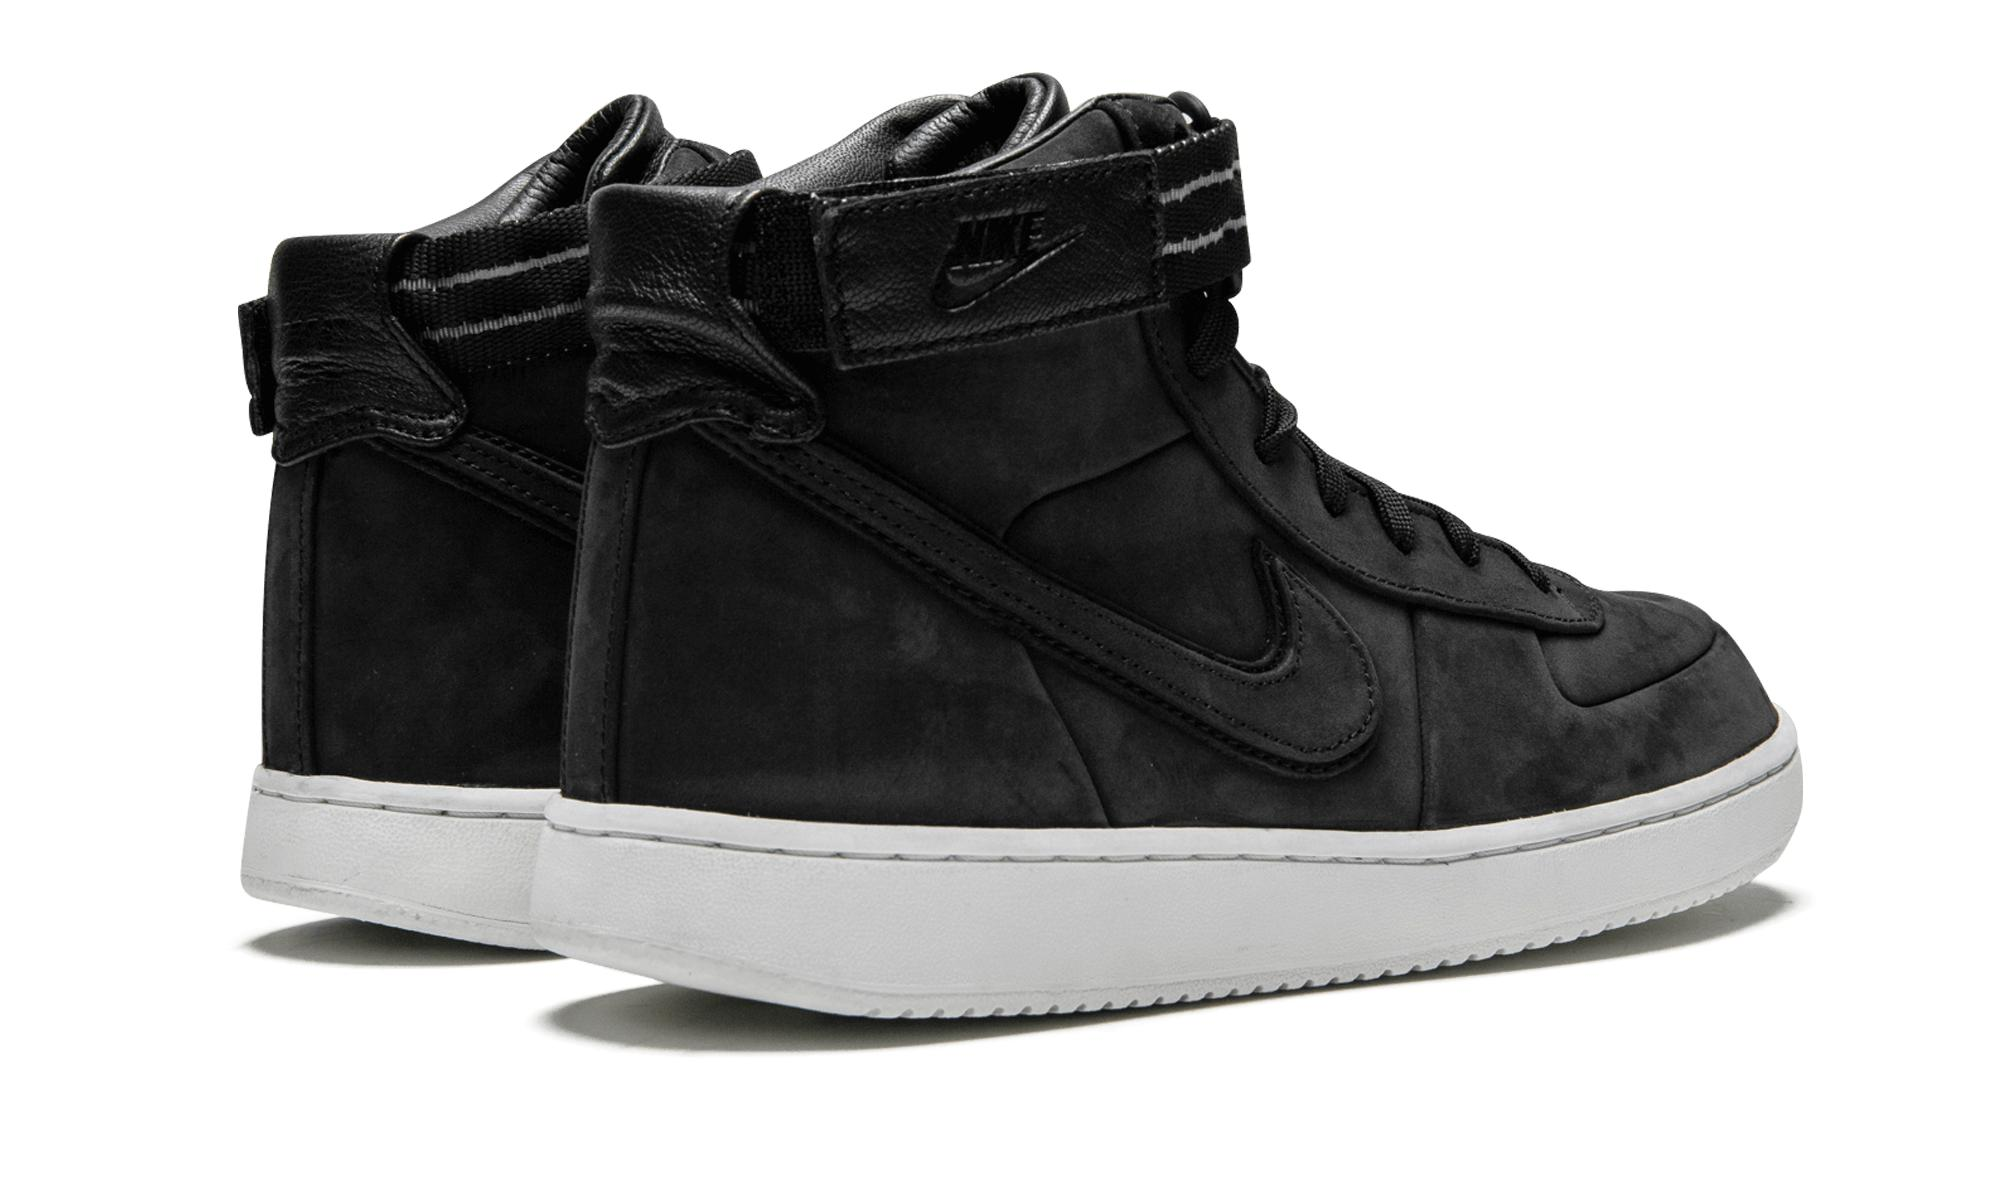 85ecdb995075 Lyst - Nike Vandal High Prm Je Qs in Black for Men